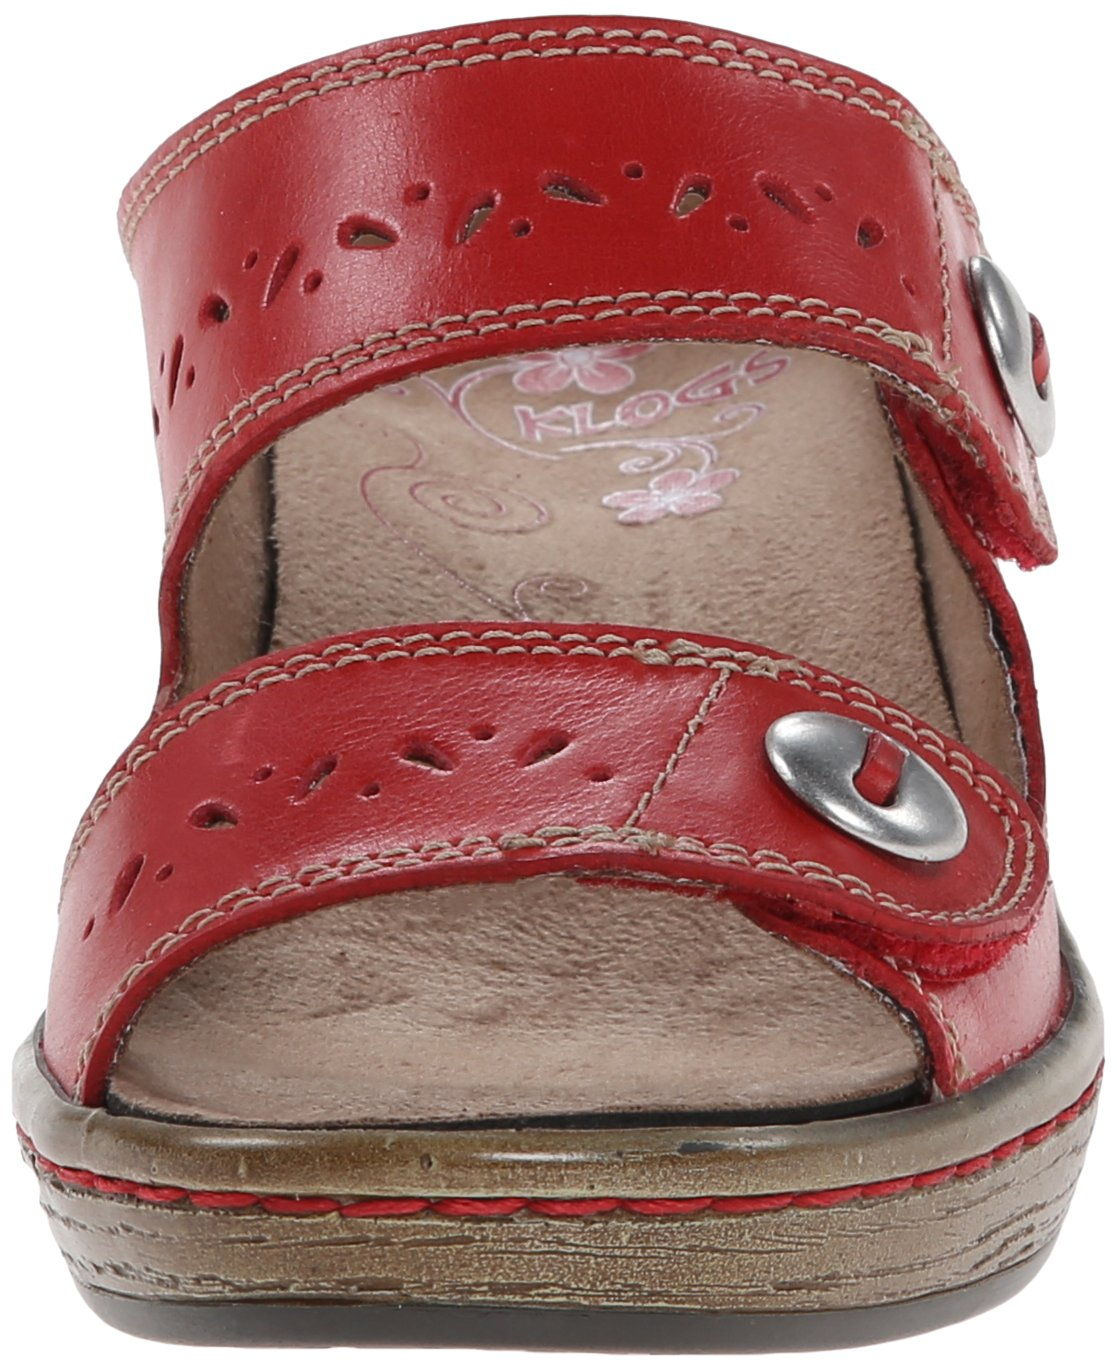 Klogs USA Women's Journey Dress Sandal B00MY7QKMY 10 B(M) US|Hunter Red